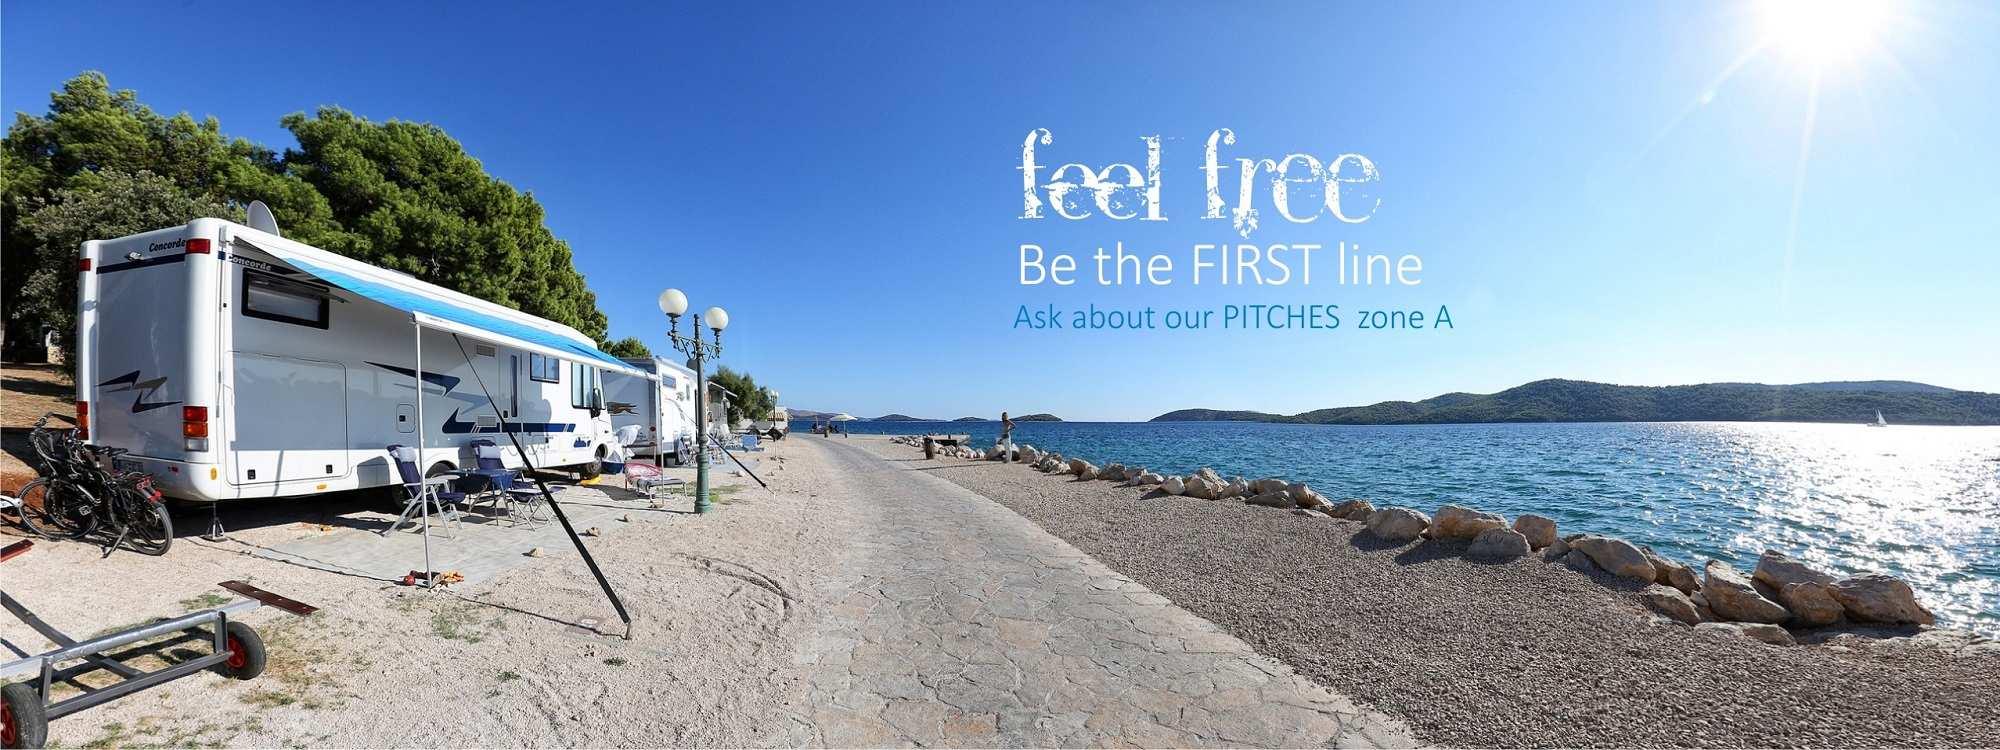 Solaris_camping_beach_resort_croatia_pitches_first_line_zoneA